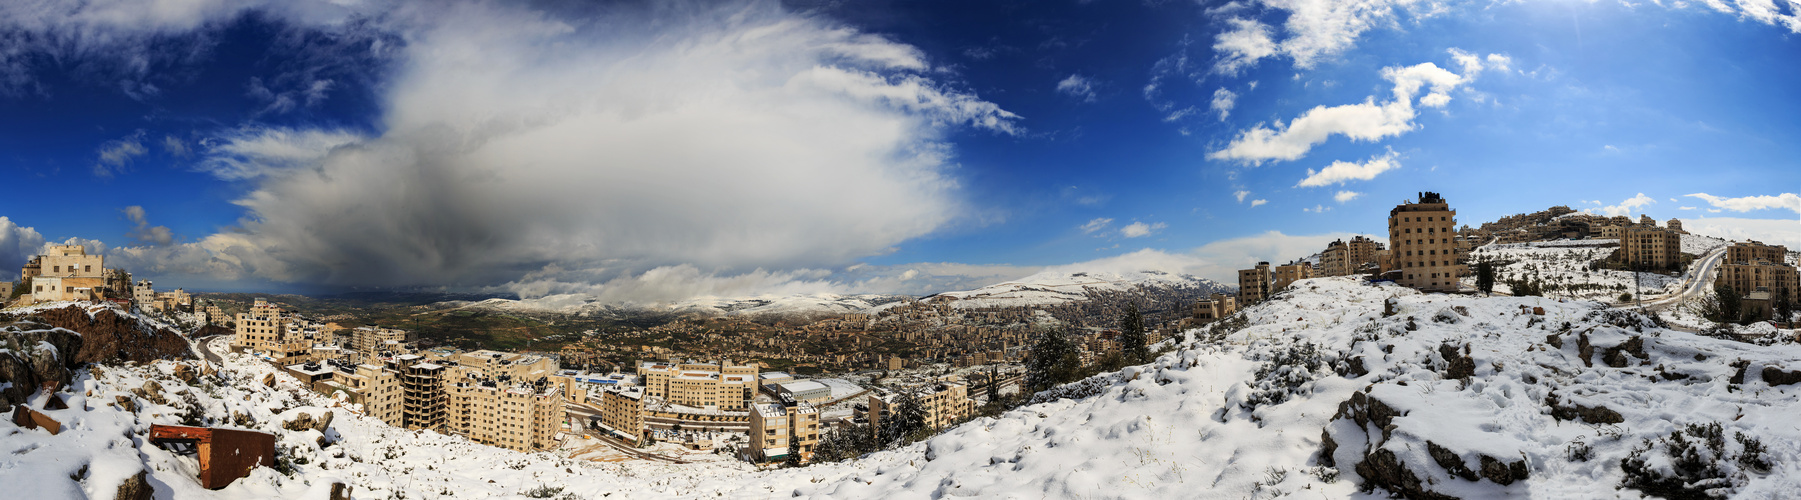 Nablus in Snow